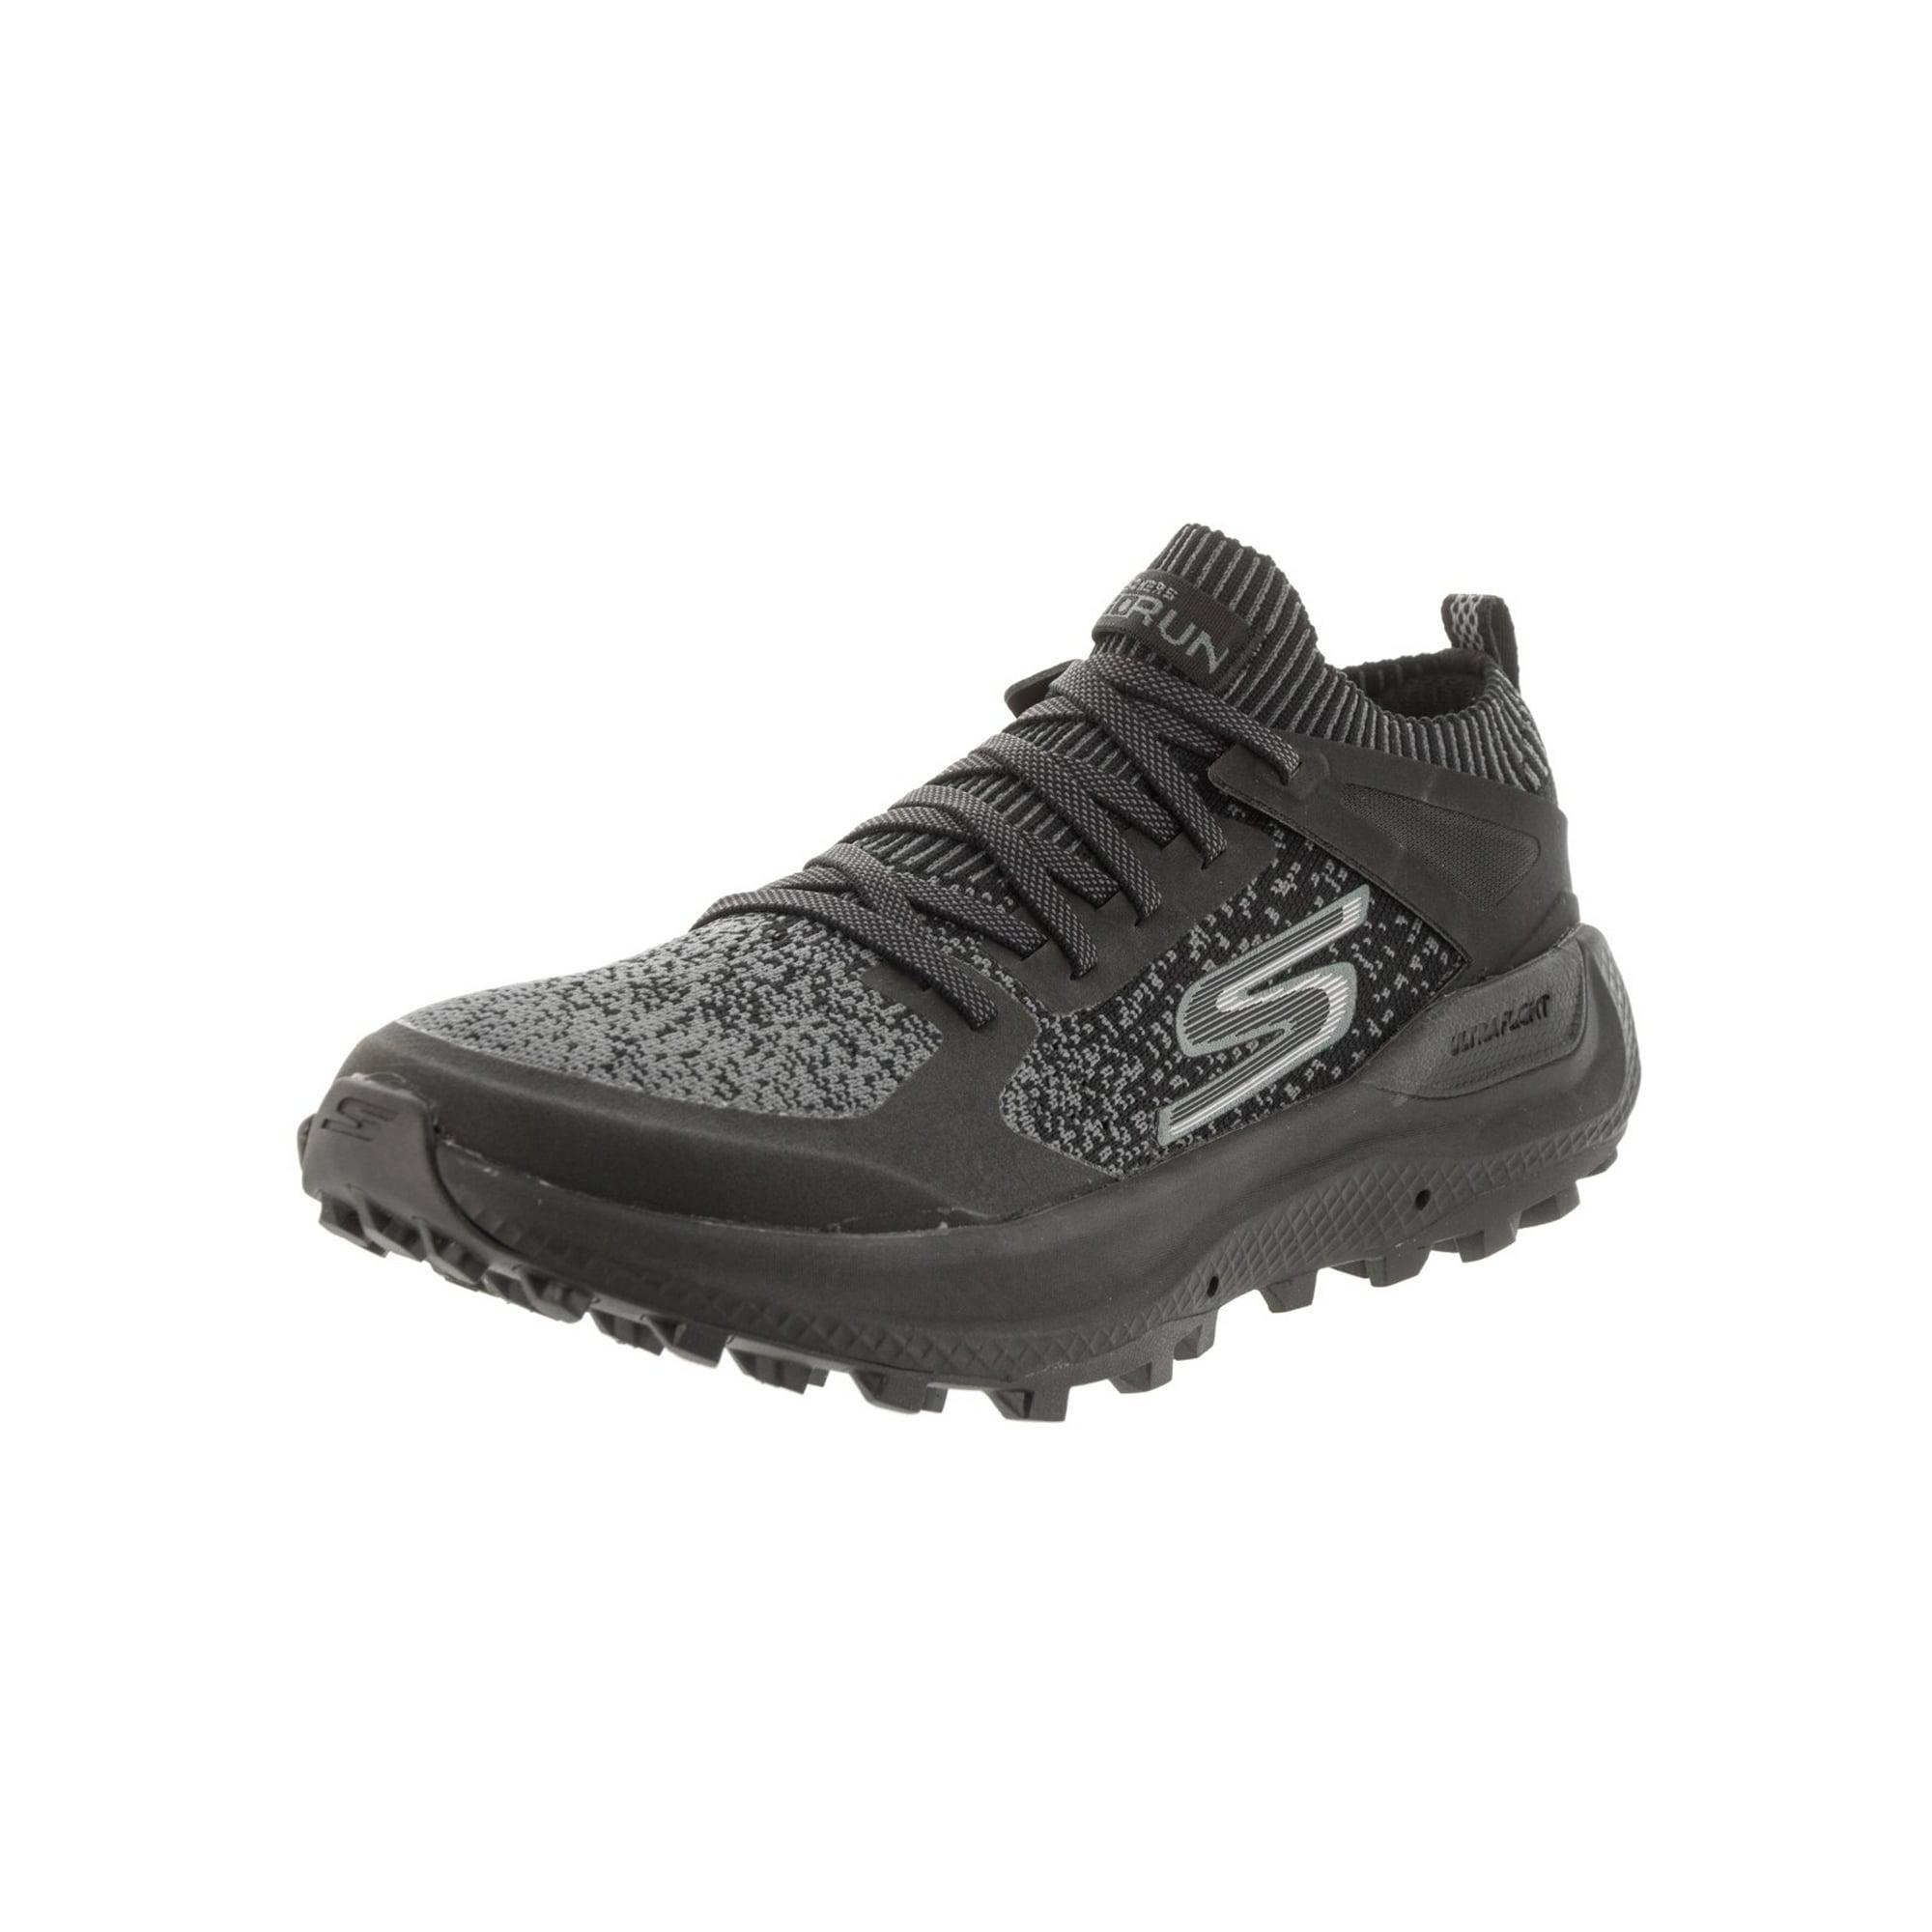 e36c50ba5089f Skechers Women's Go Run Max Trail 5 Ultra Lifestyle Shoe | Walmart ...